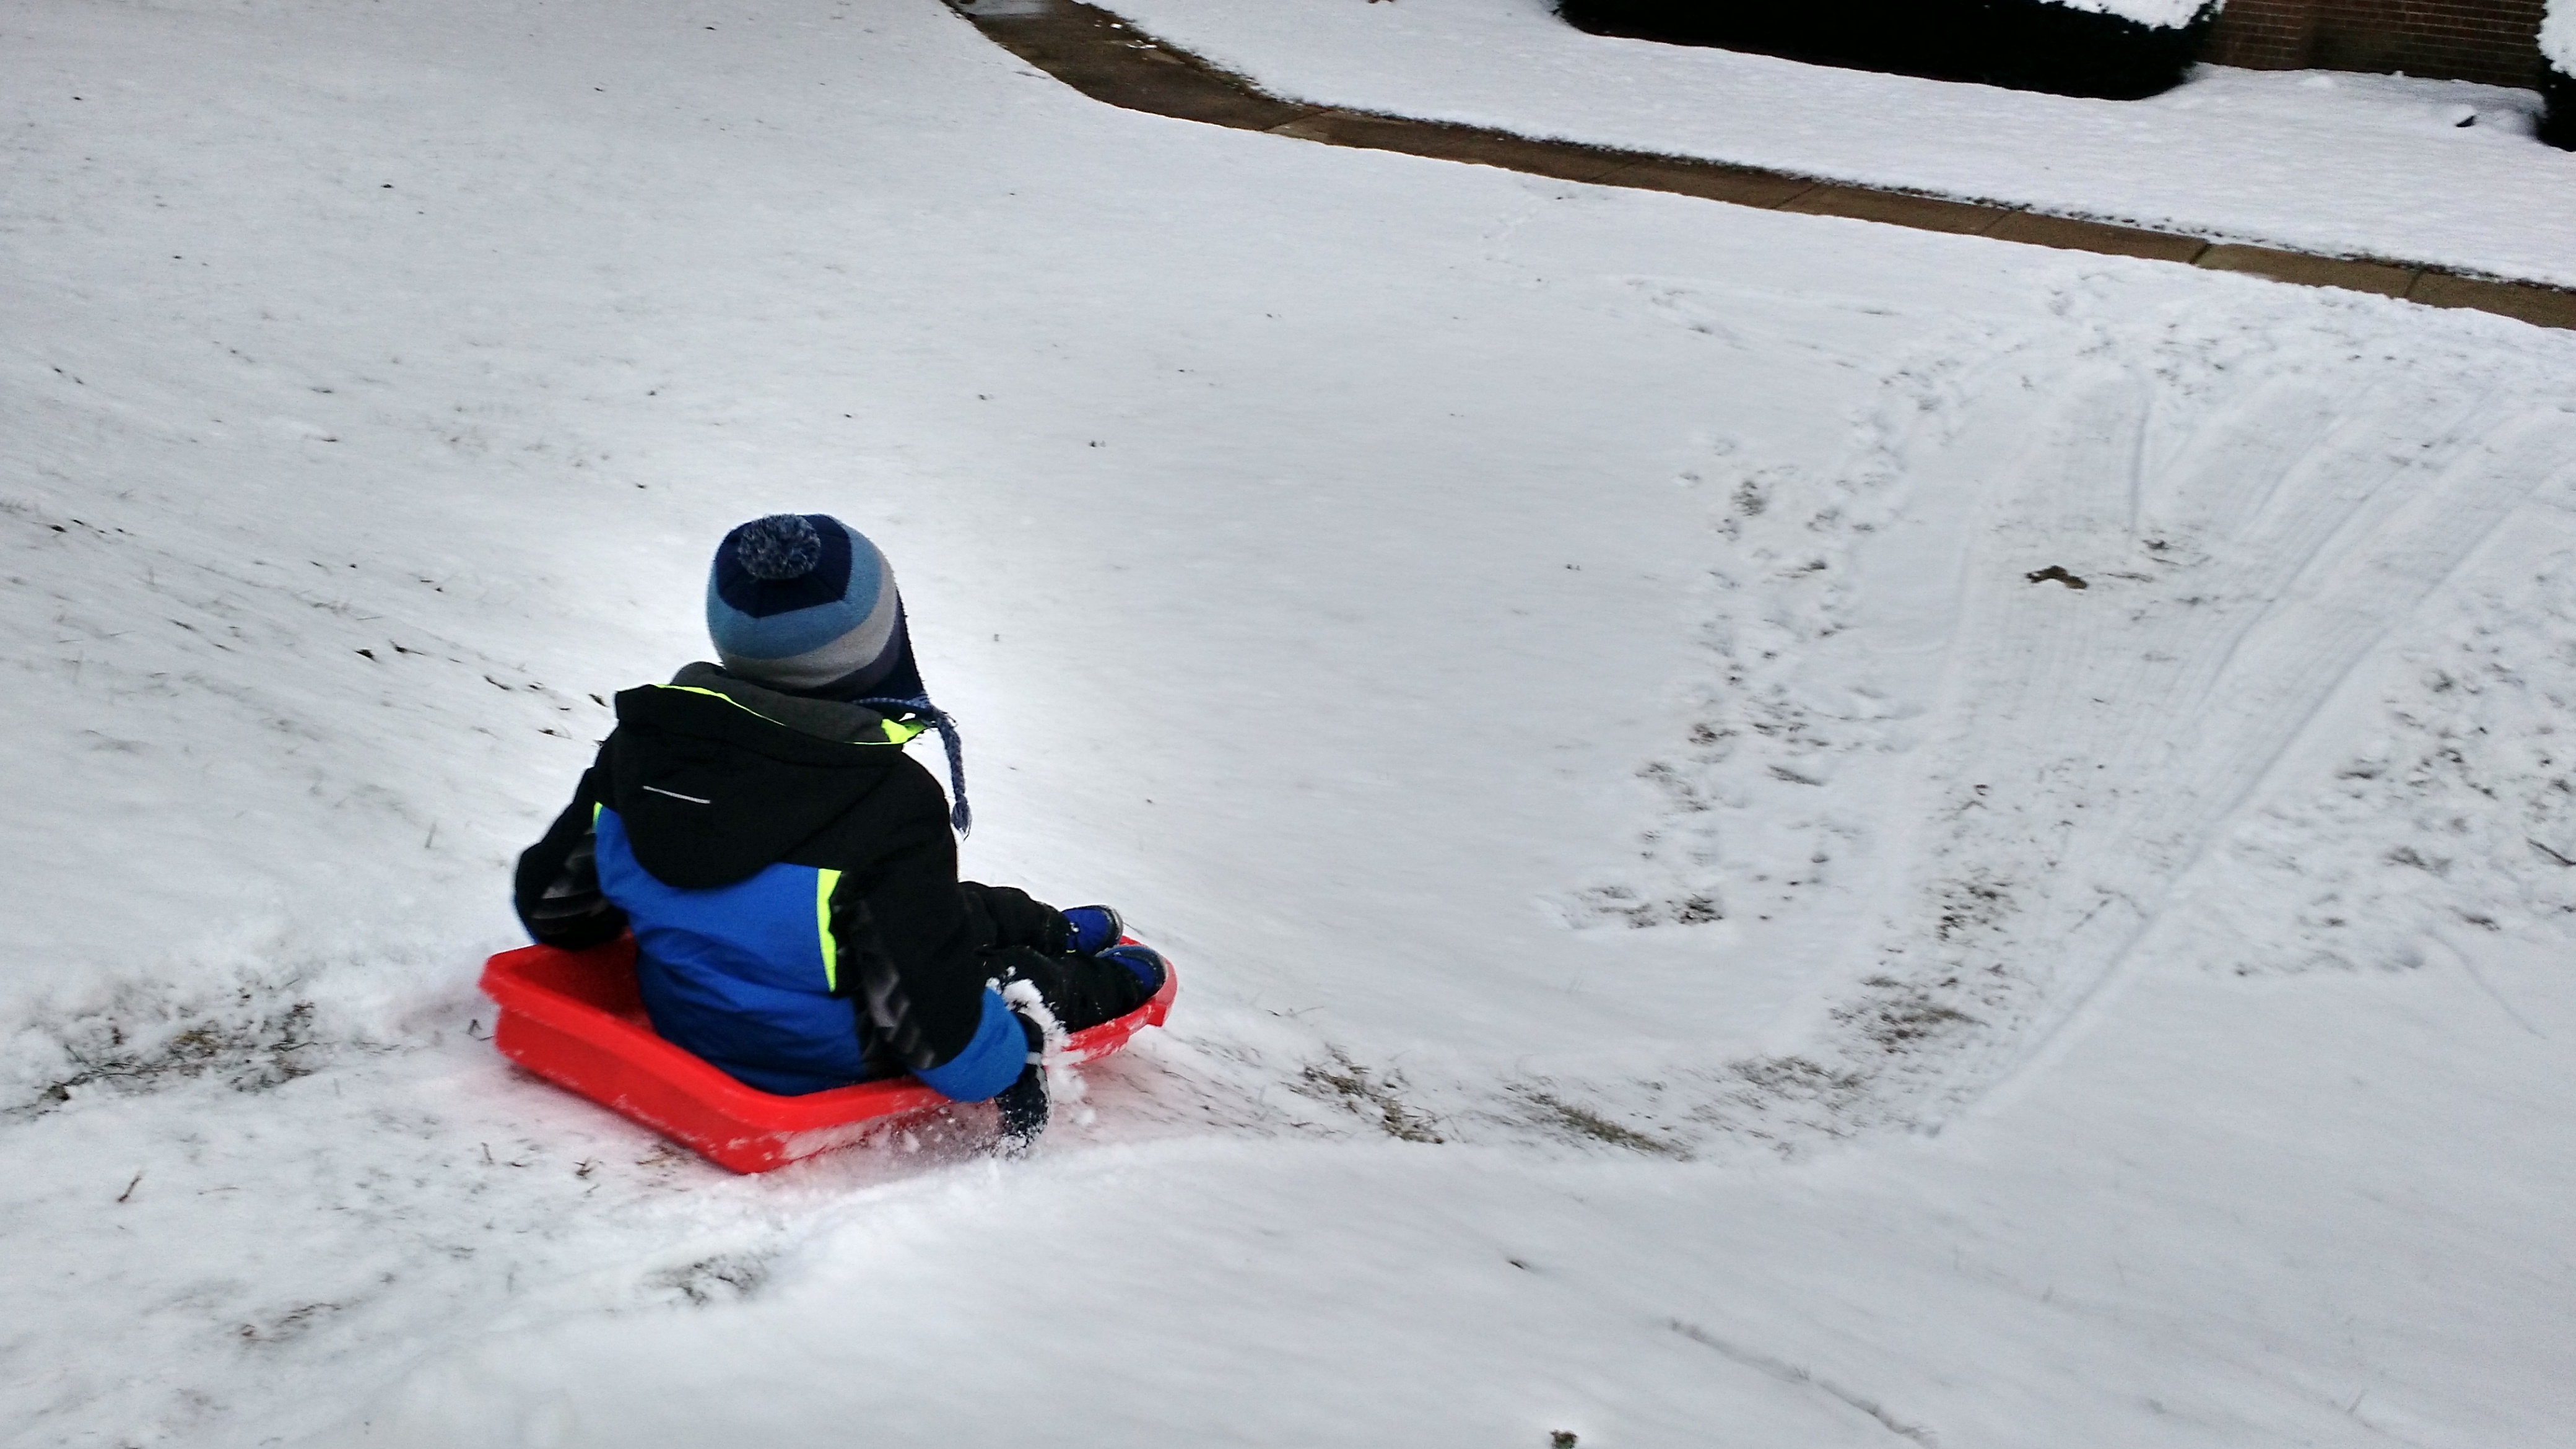 KFP sledding down snowy hill